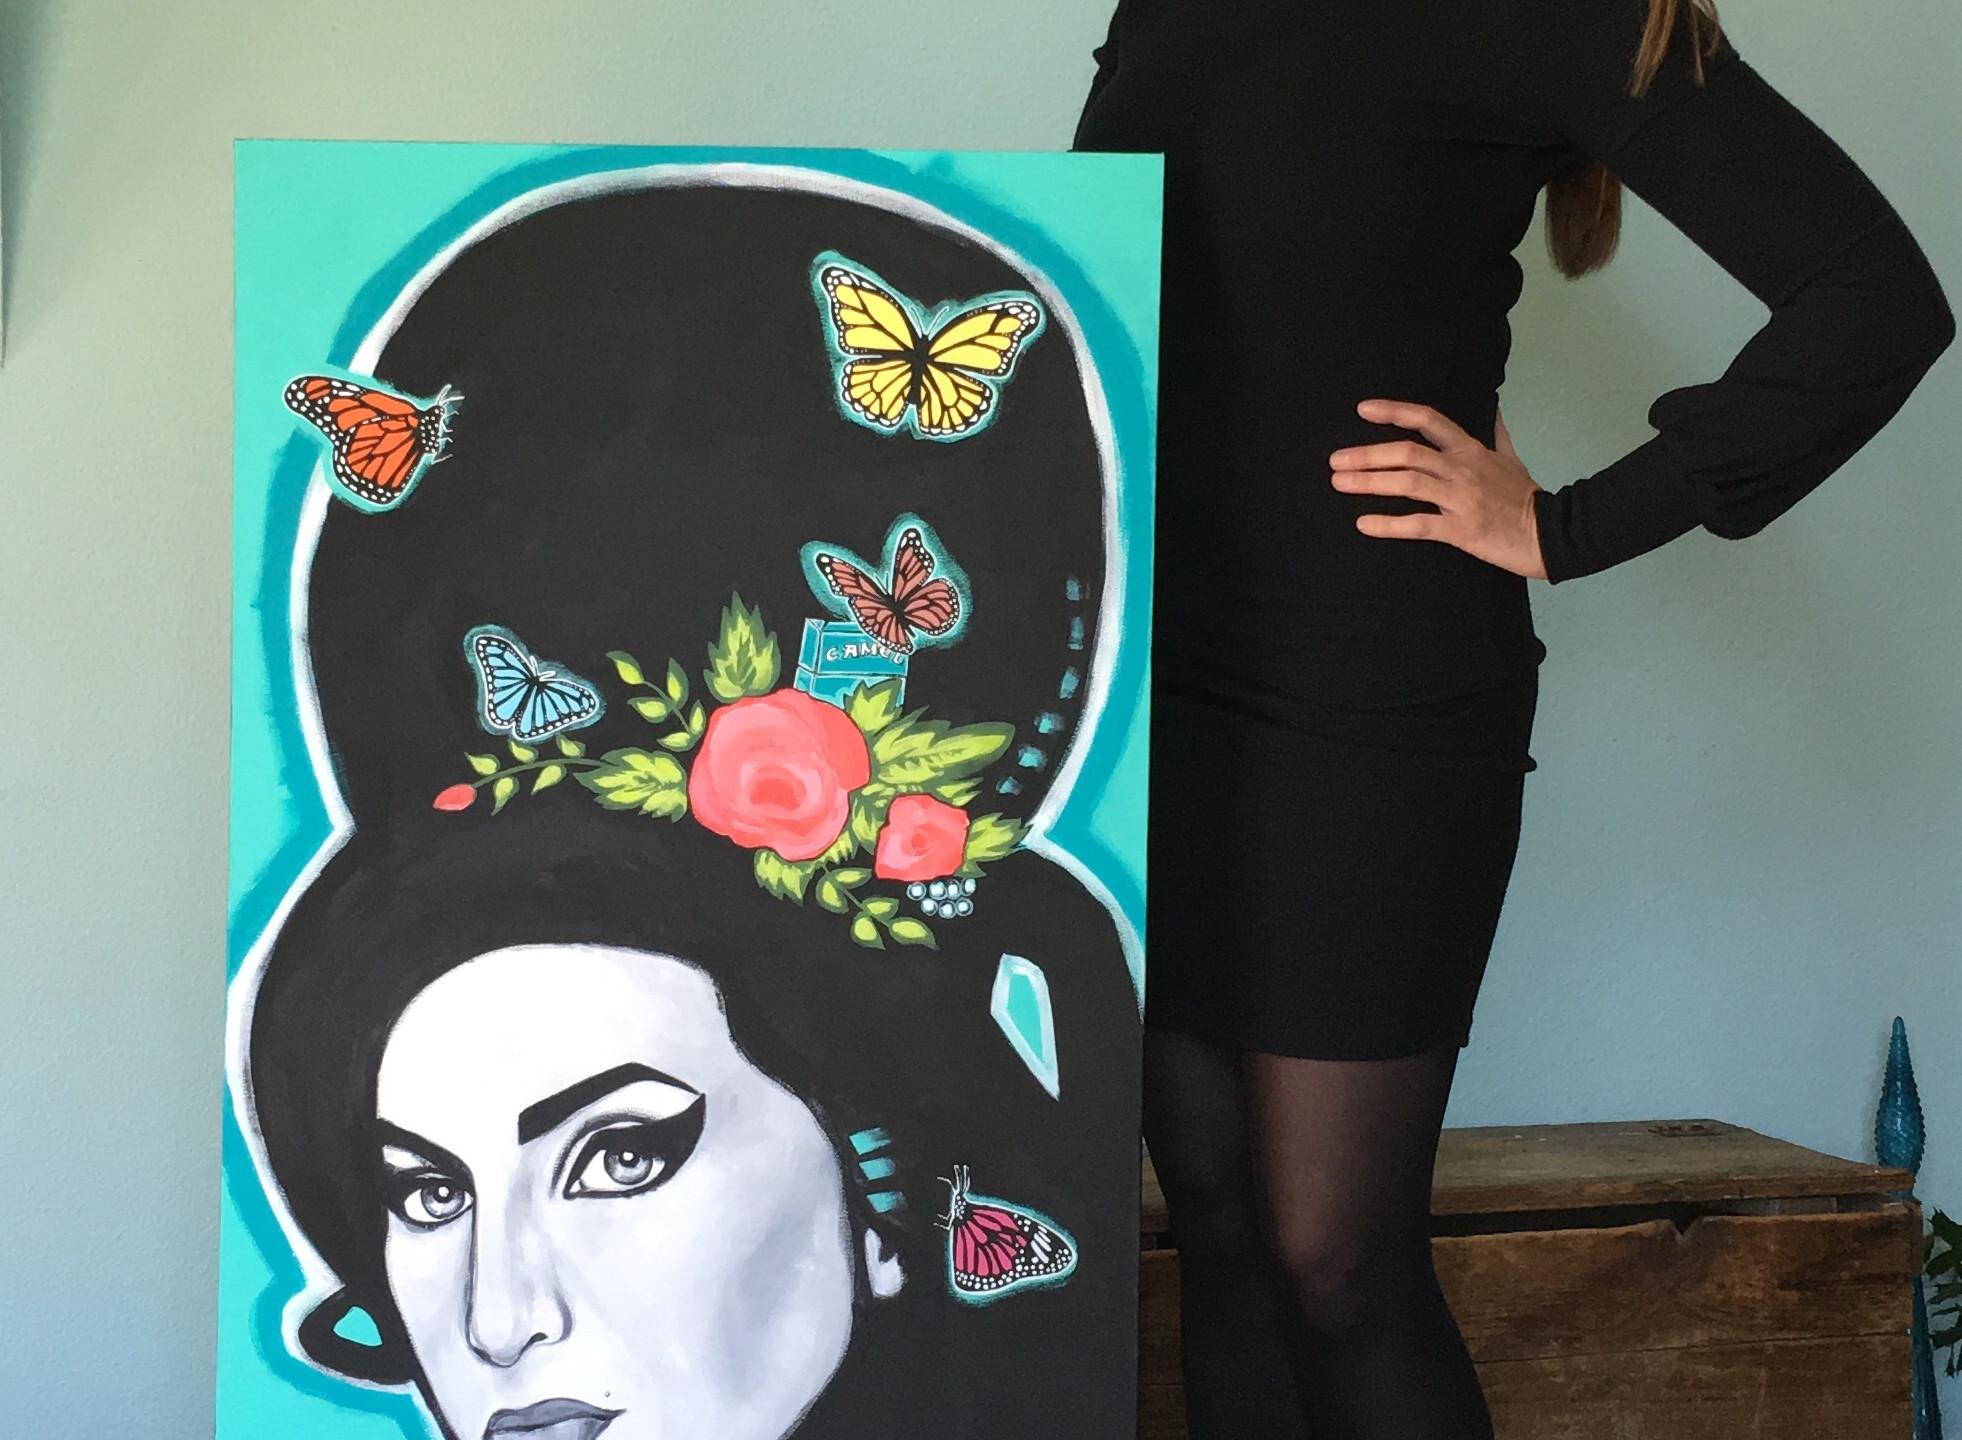 Amy Winehouse painting, original artwork by artist Carrie Milburn